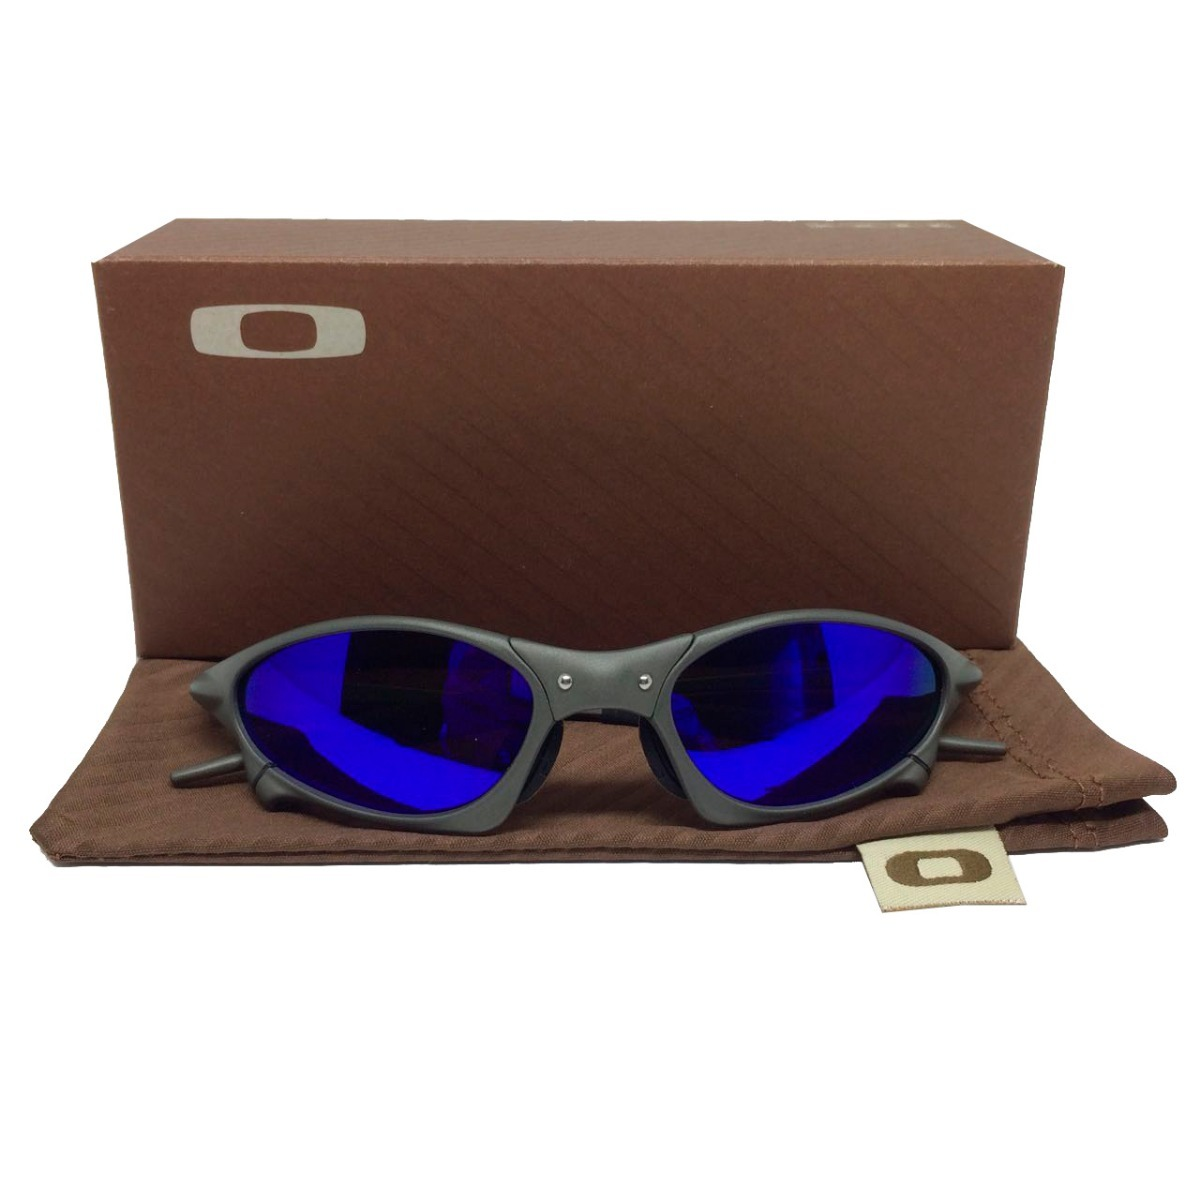 337208deaf4e4 Óculos Oakley Penny Azul Juliete 24k Polarizado Original - R  149